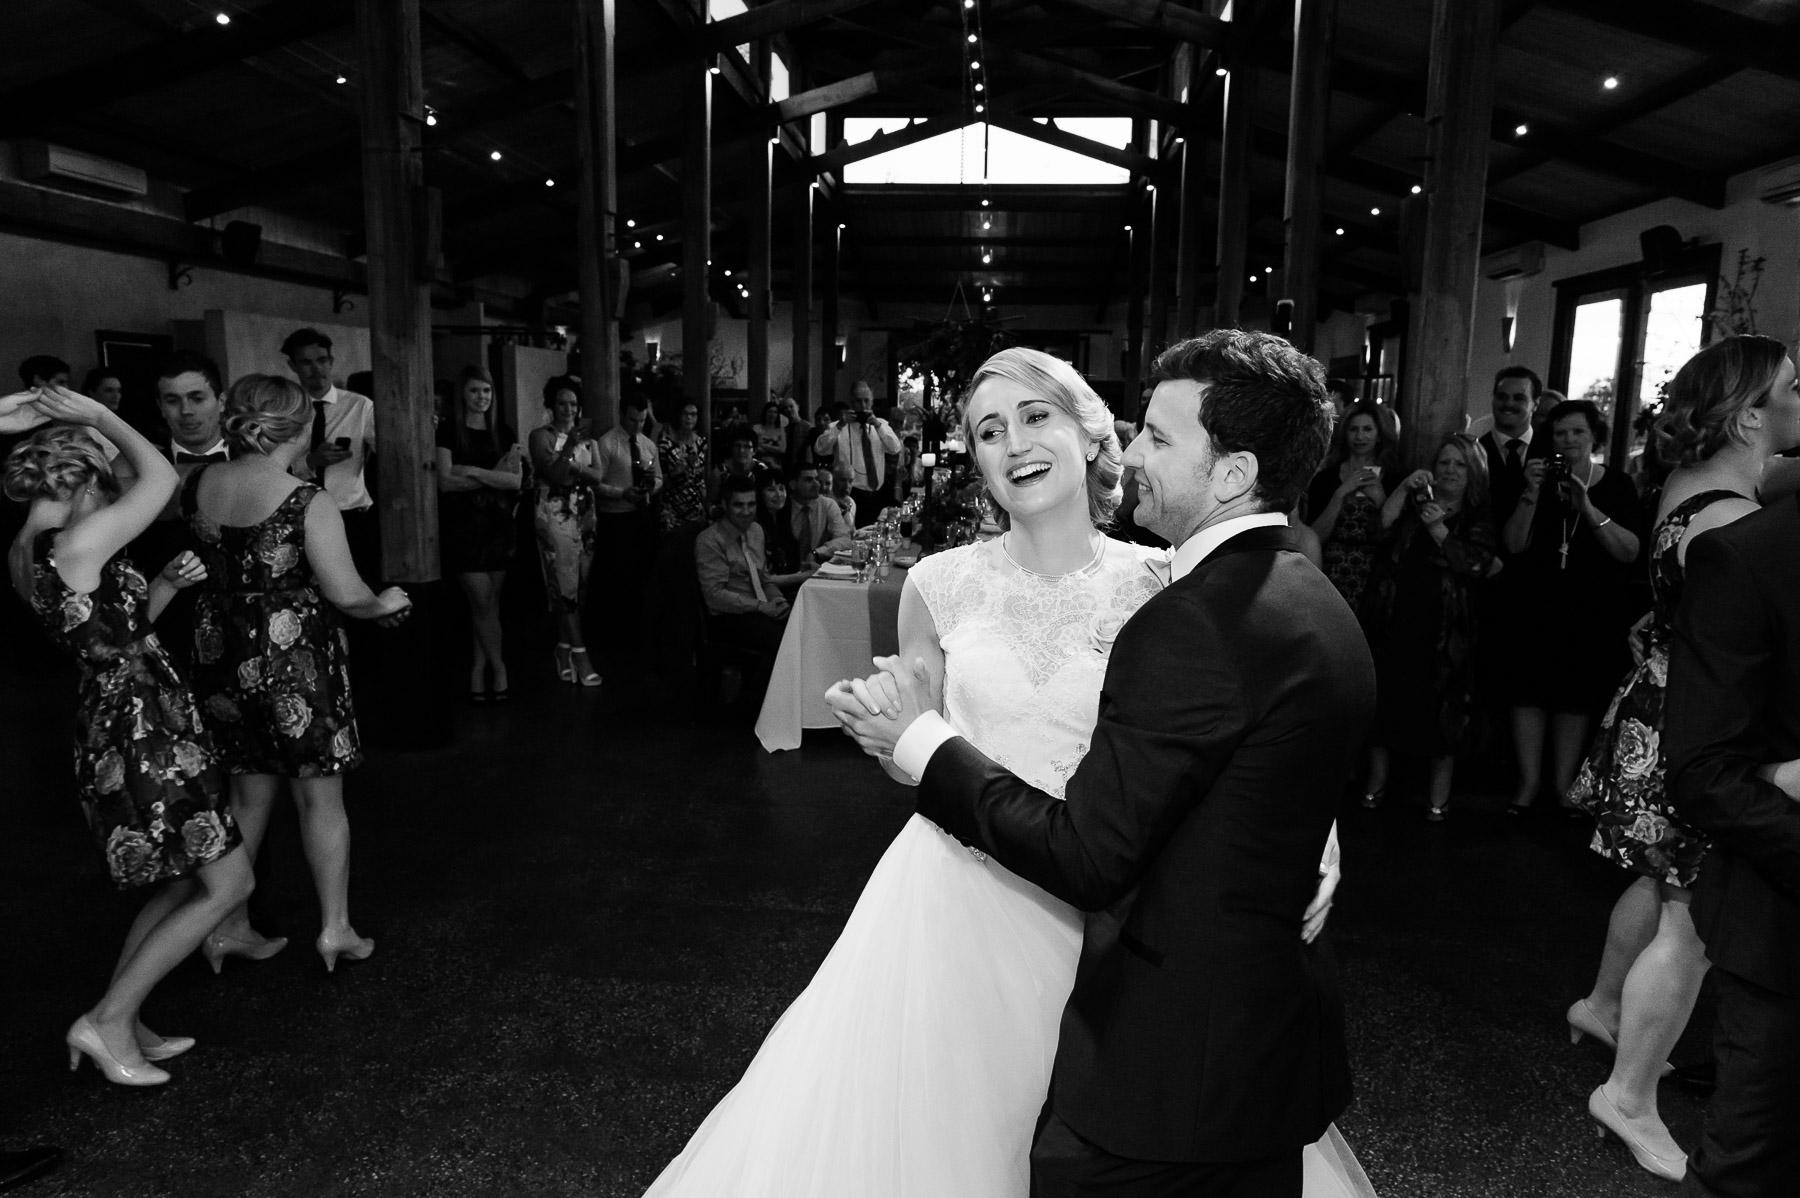 Marnie_and_Charlie_Yarra_Valley_Wedding_Blog-84.jpg